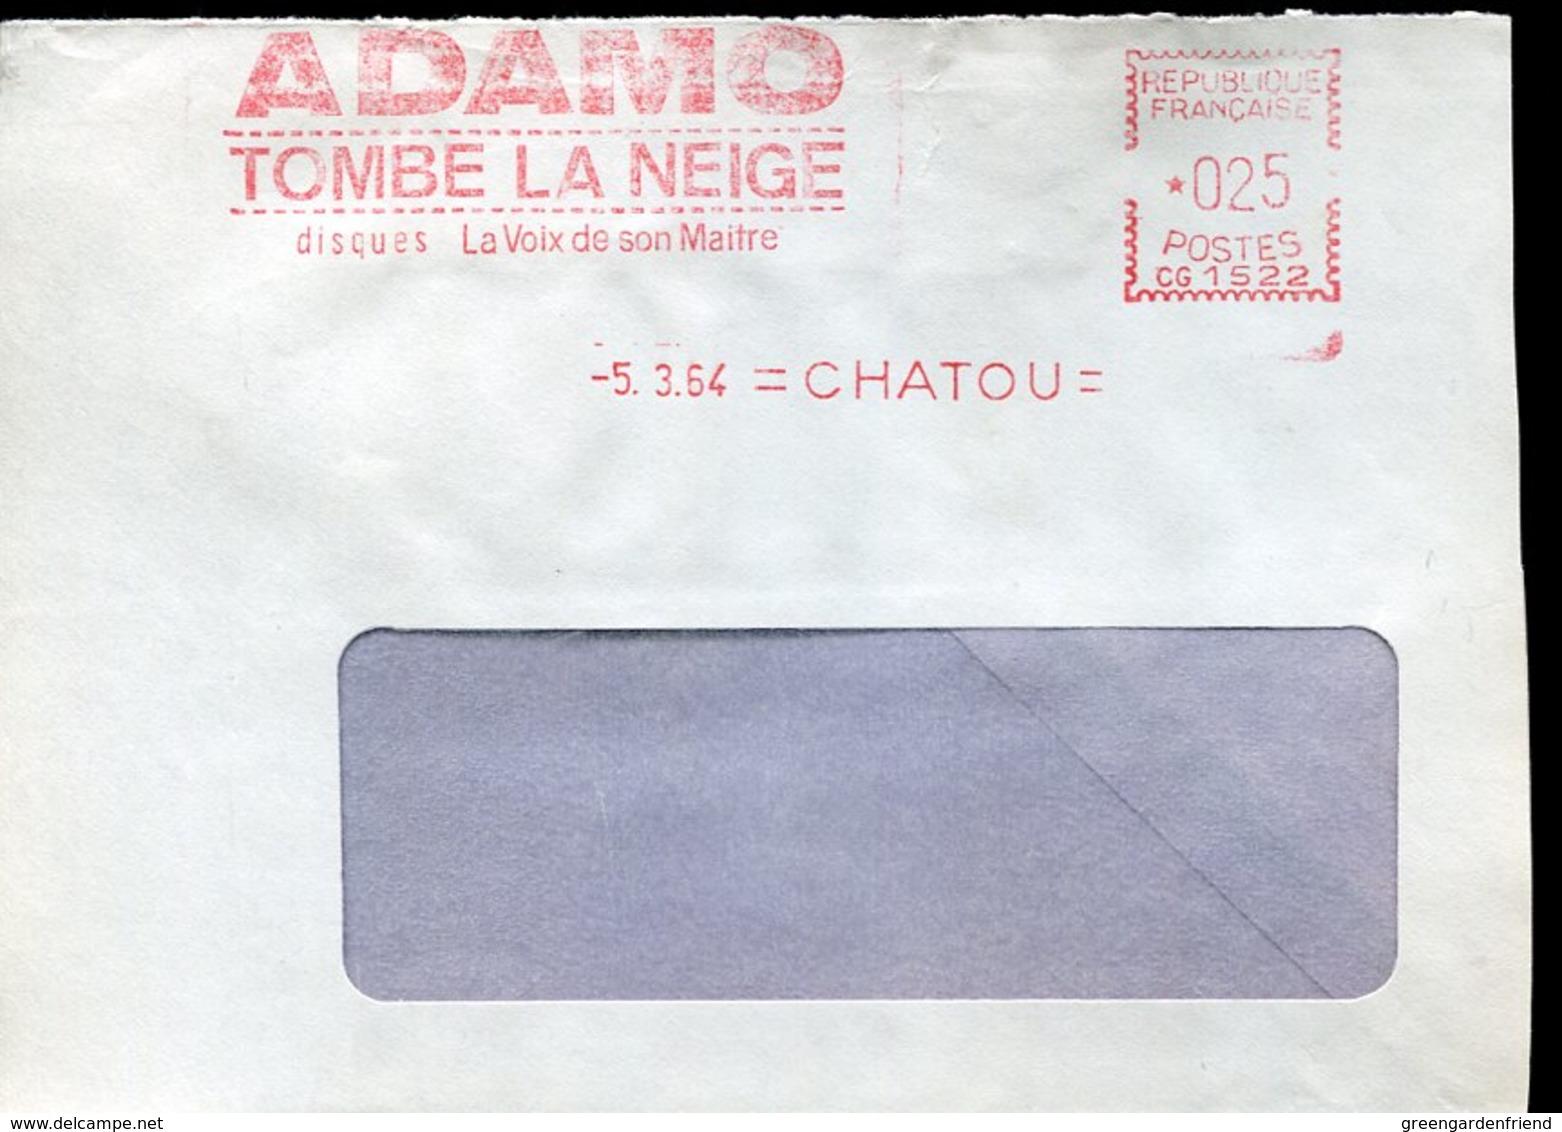 52433 France, Red Meter Freistempel EMA,1964 Chatou,  Adamo  Tombe La Neige Disques La Voix Du Maitre - EMA (Printer Machine)